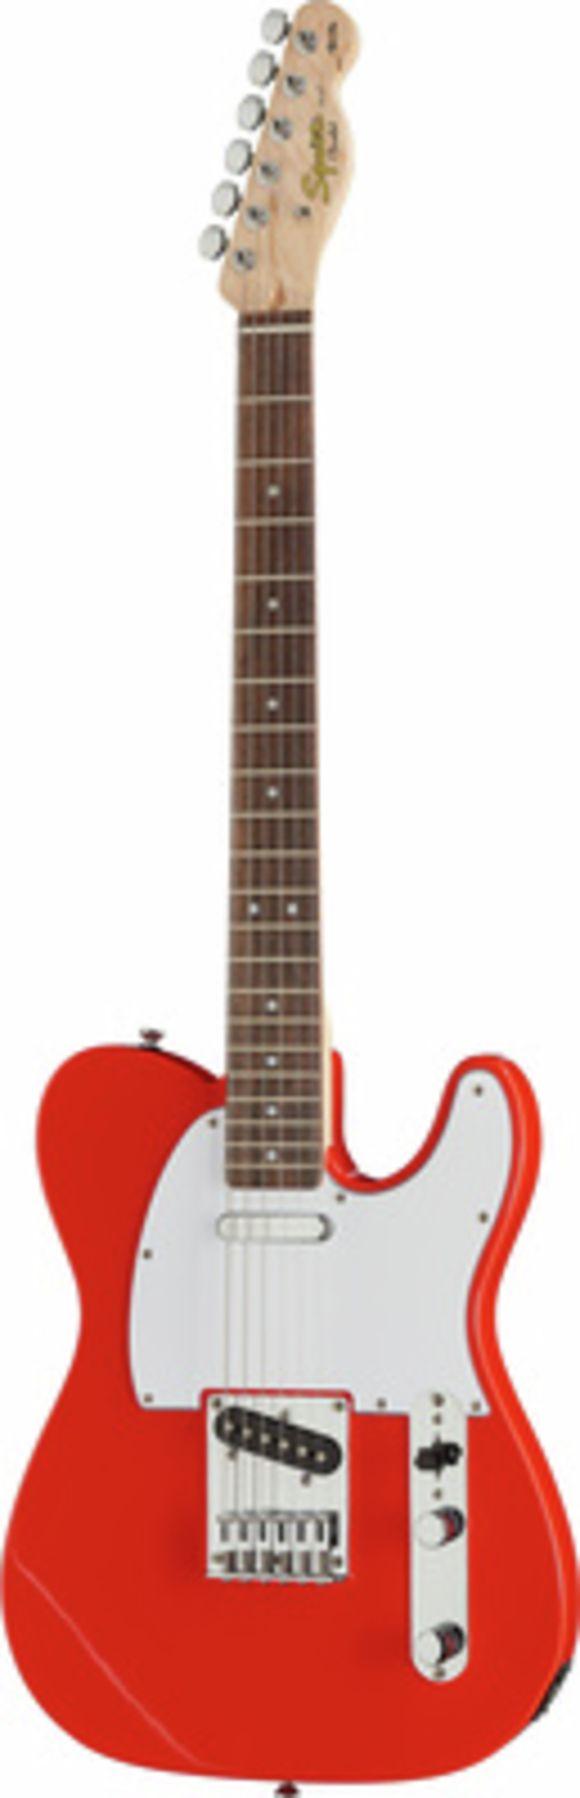 Squier Affinity Tele RR IL Fender